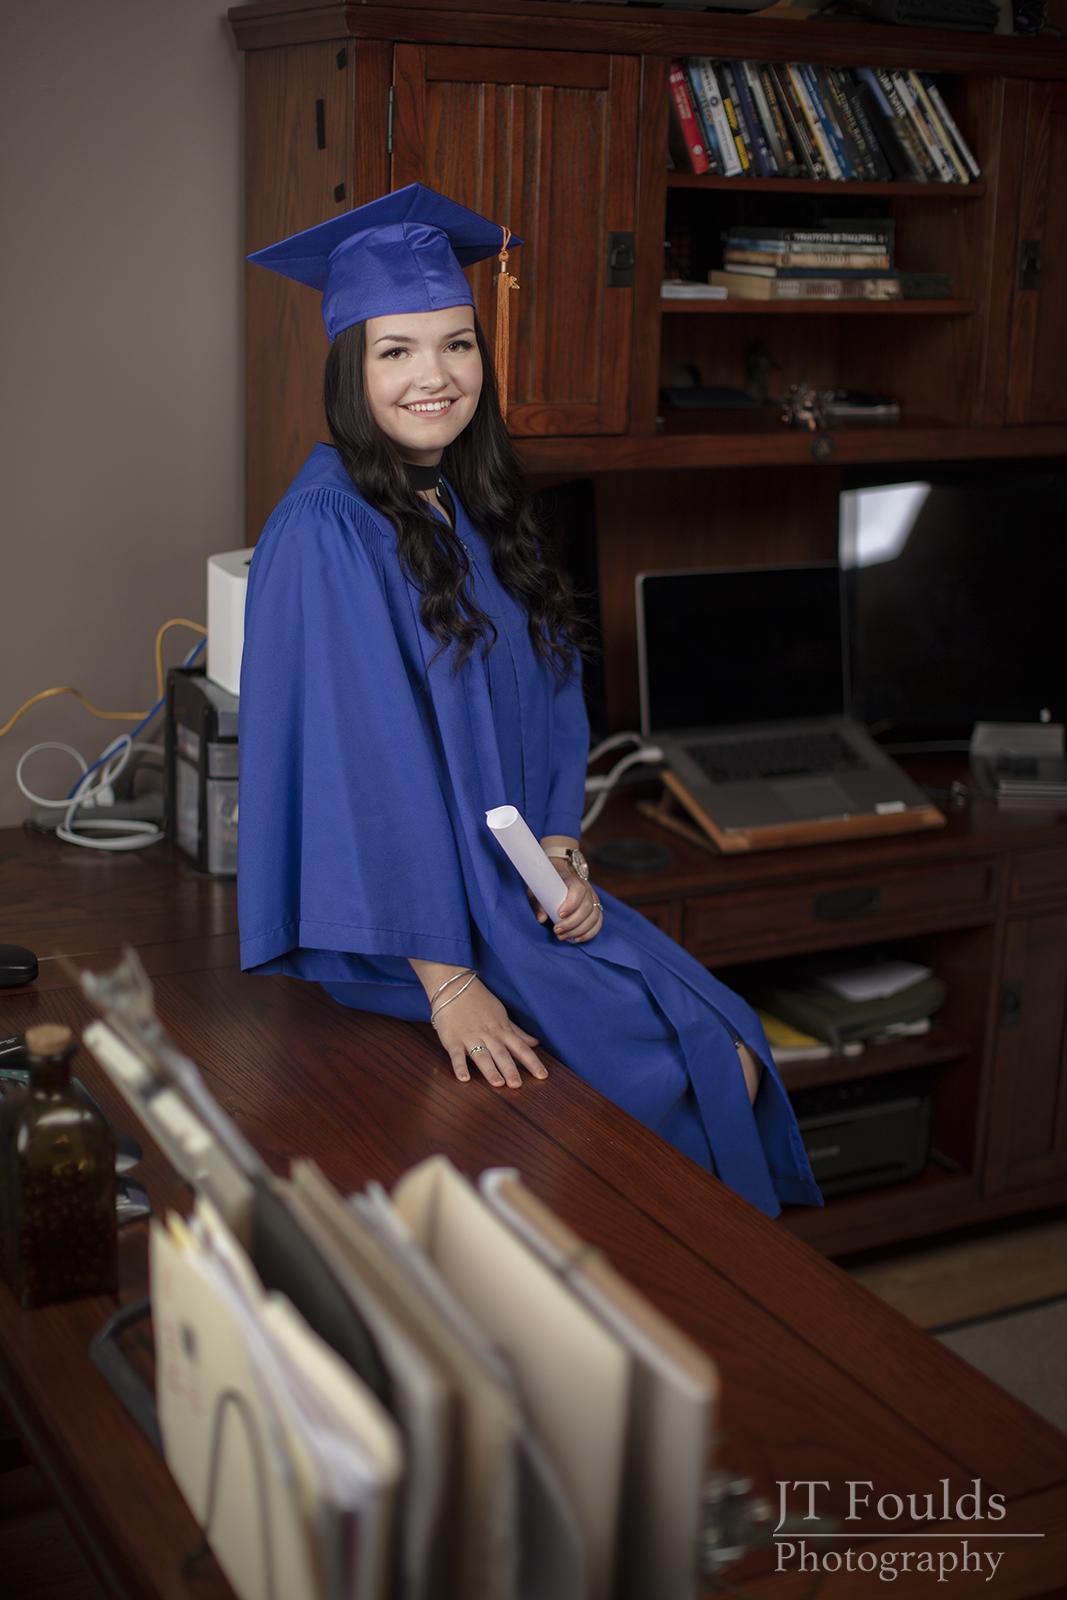 Keirstead _ Orr Graduation Shoot - 26 Jun '18 - 11.jpg